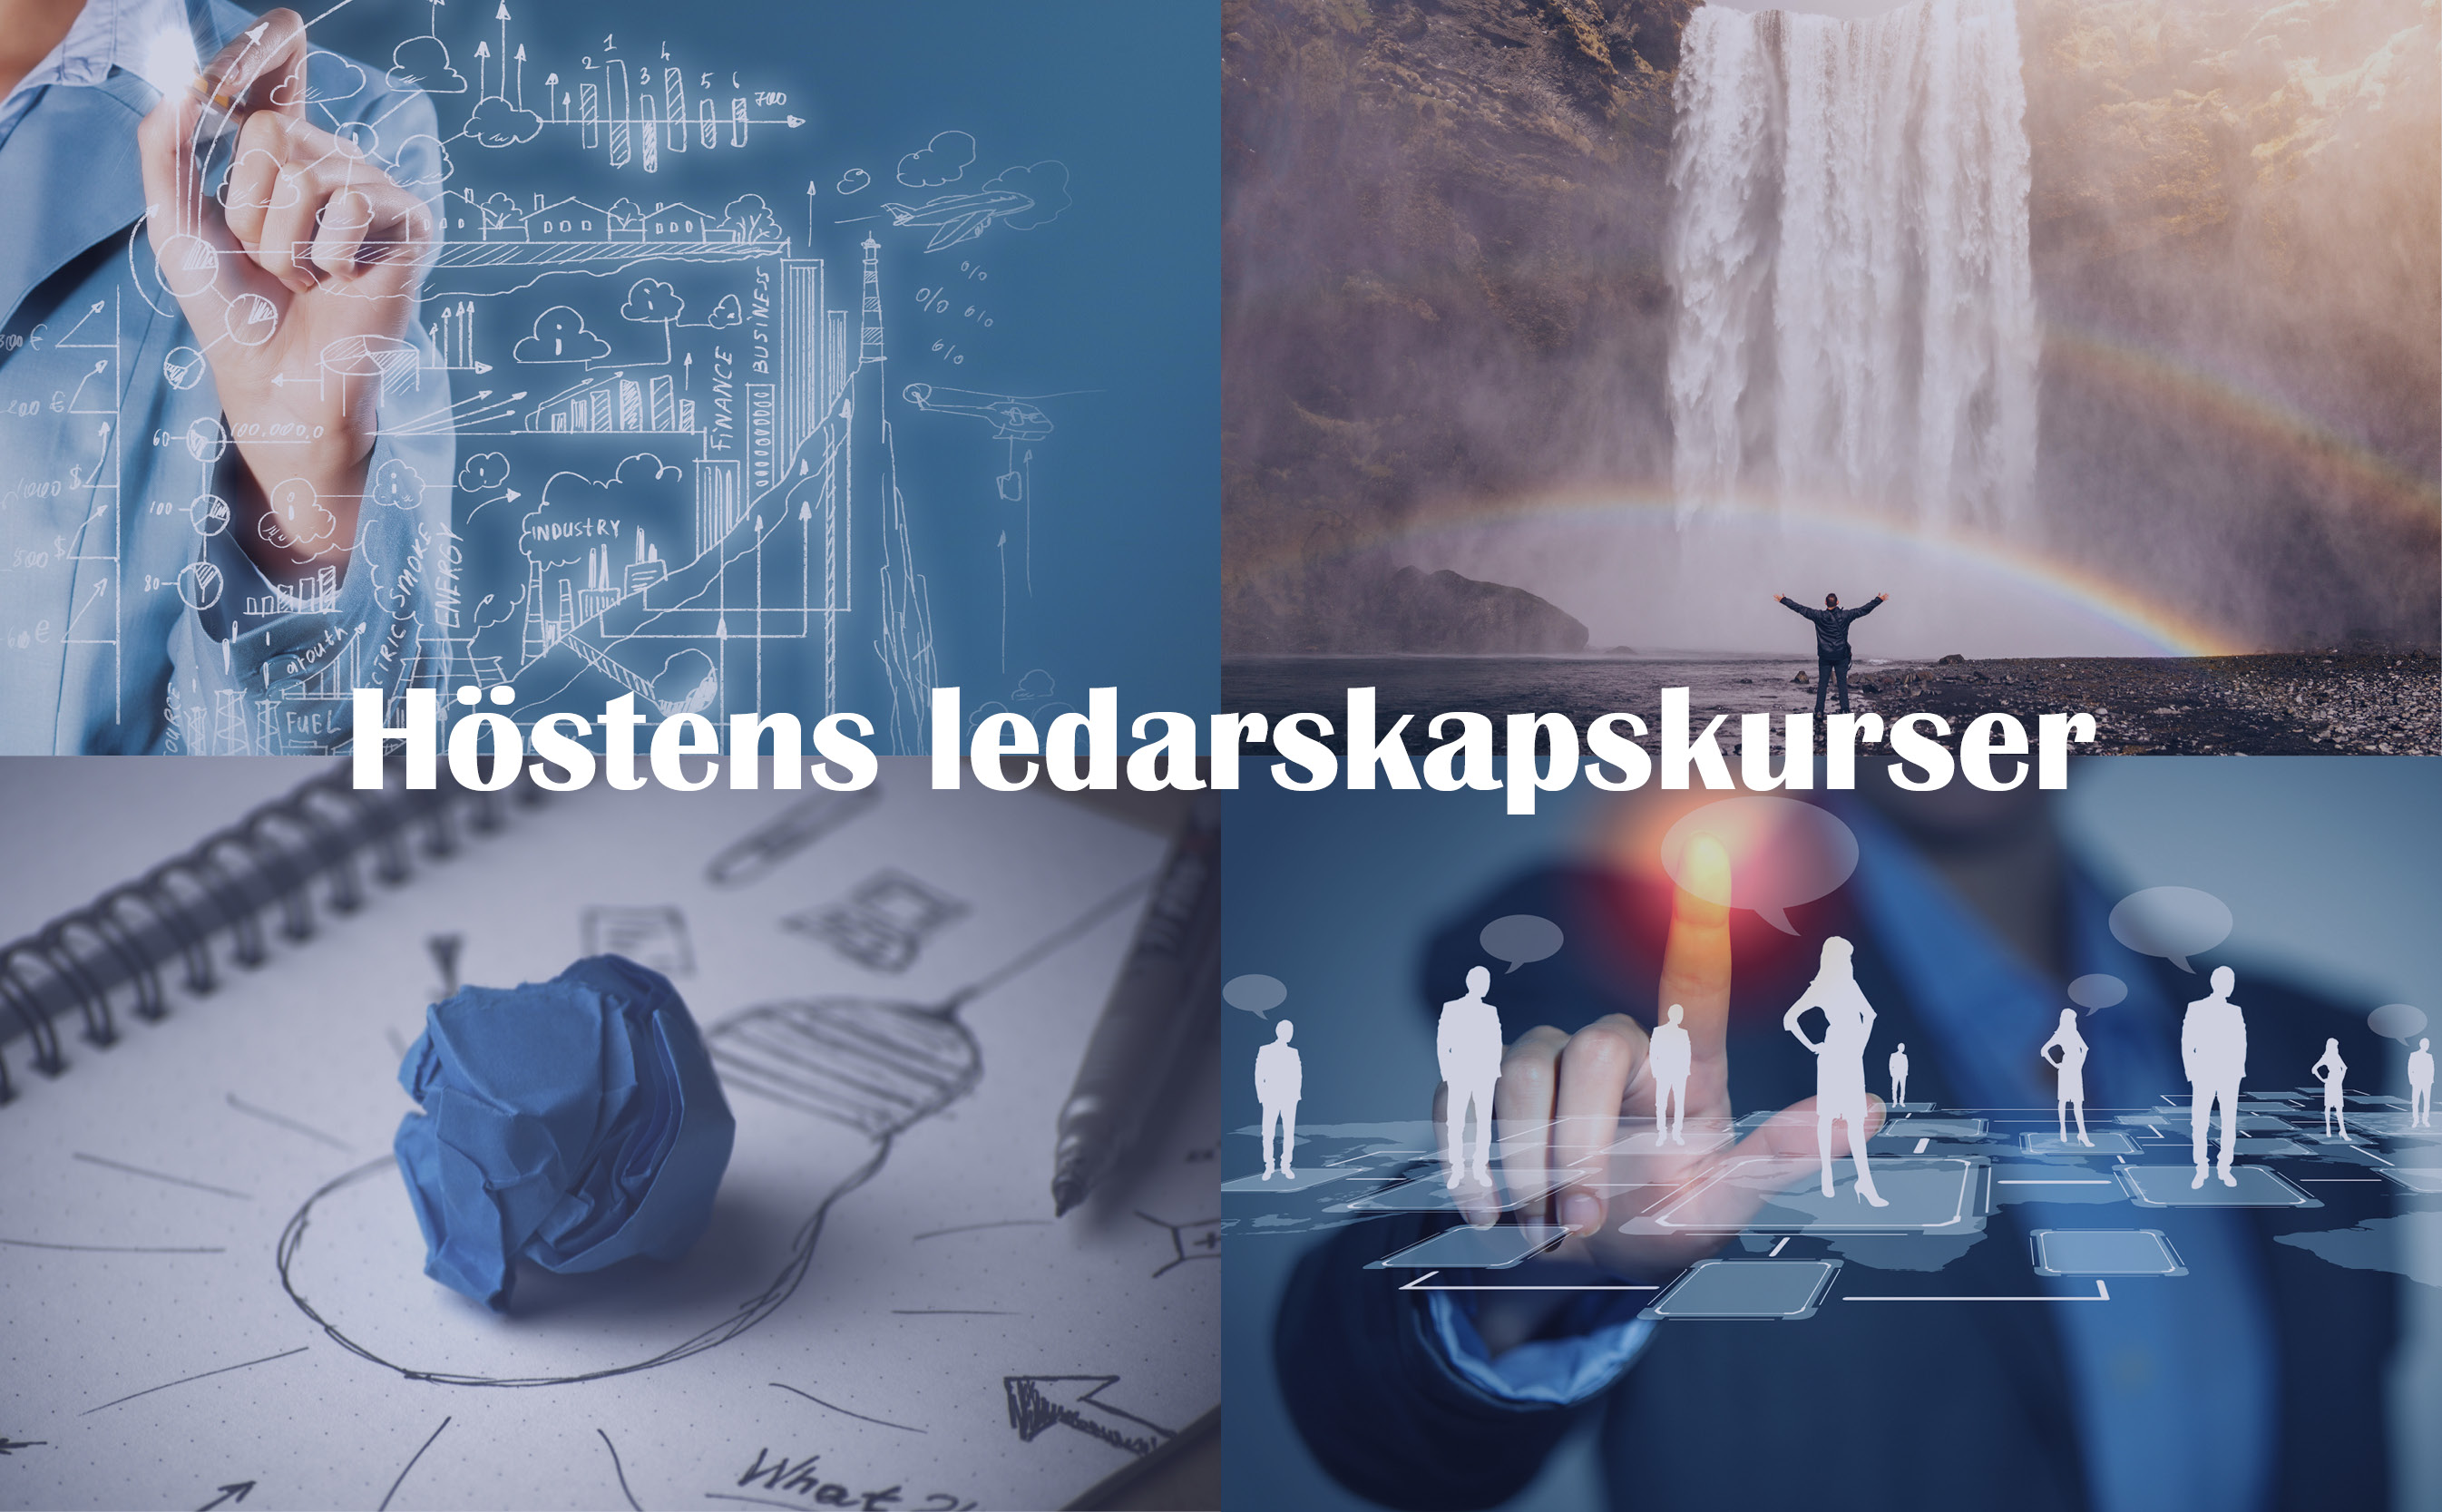 hostens_ledarskapskurser